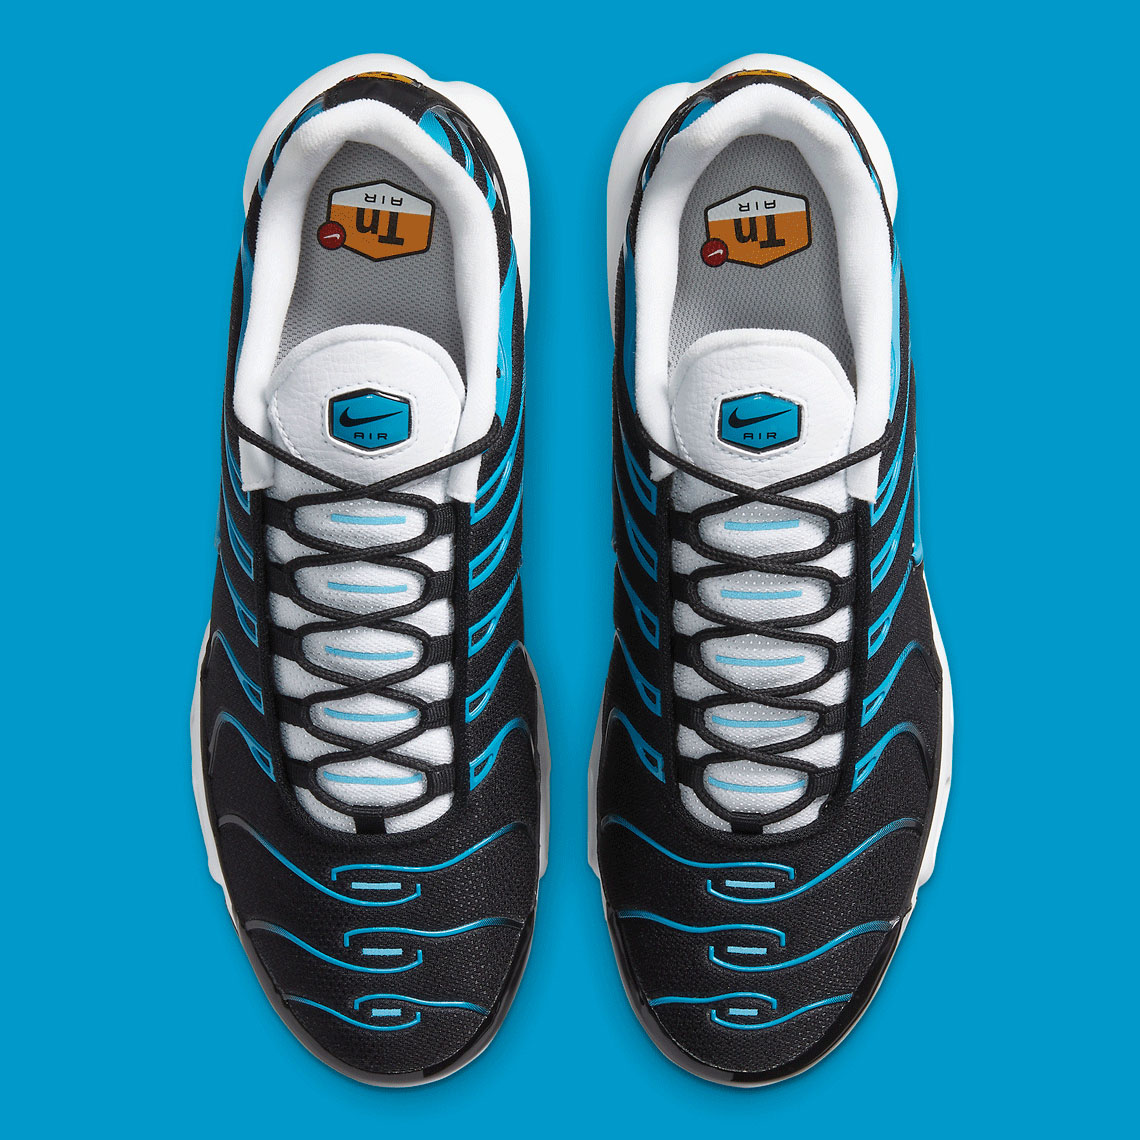 nike-air-max-plus-black-laser-blue-release-date-price-3